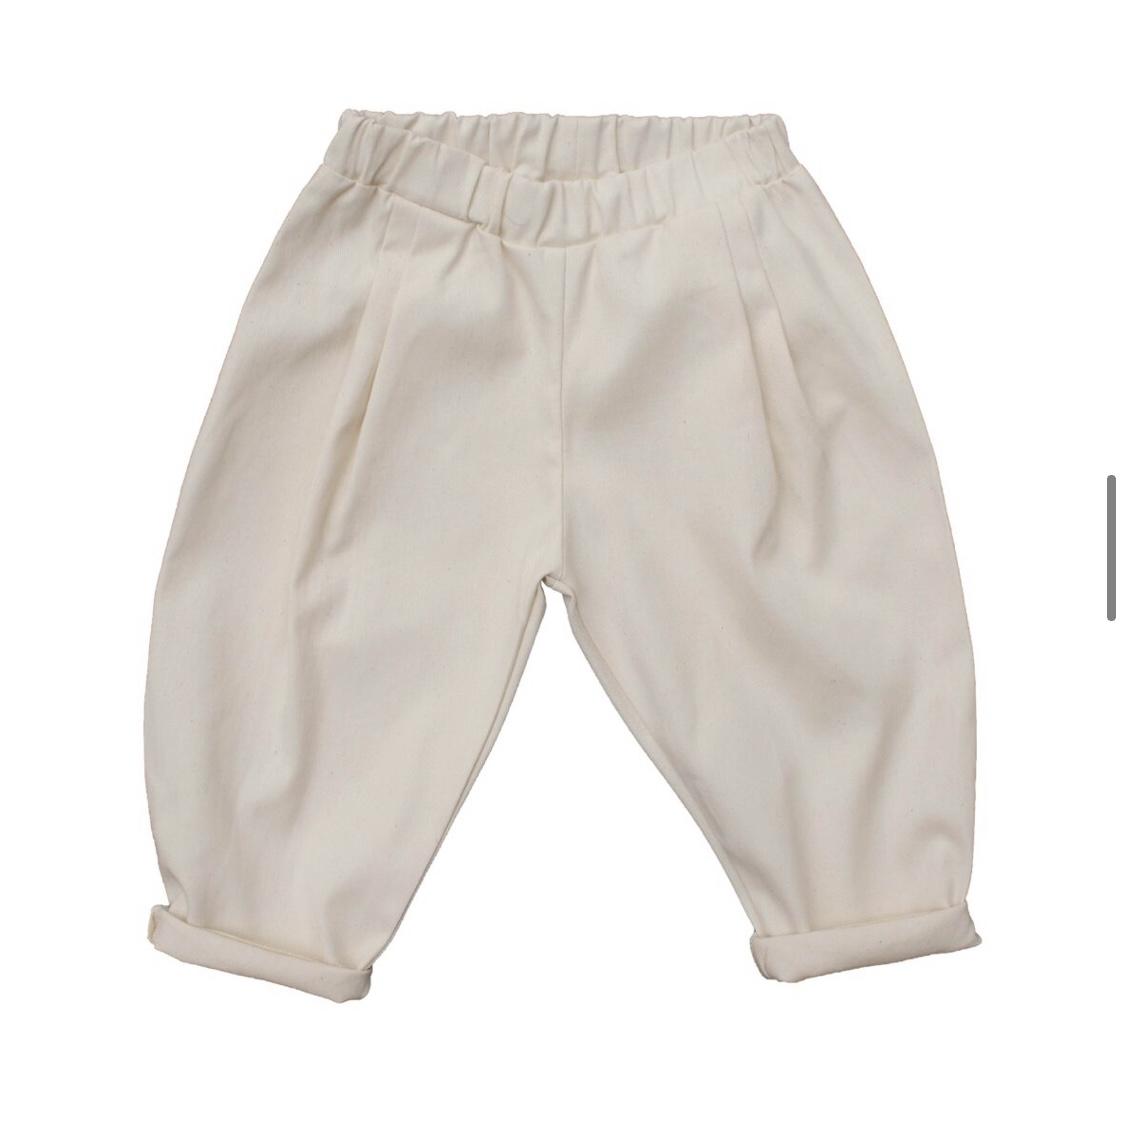 Pantalone elegance in gabardine